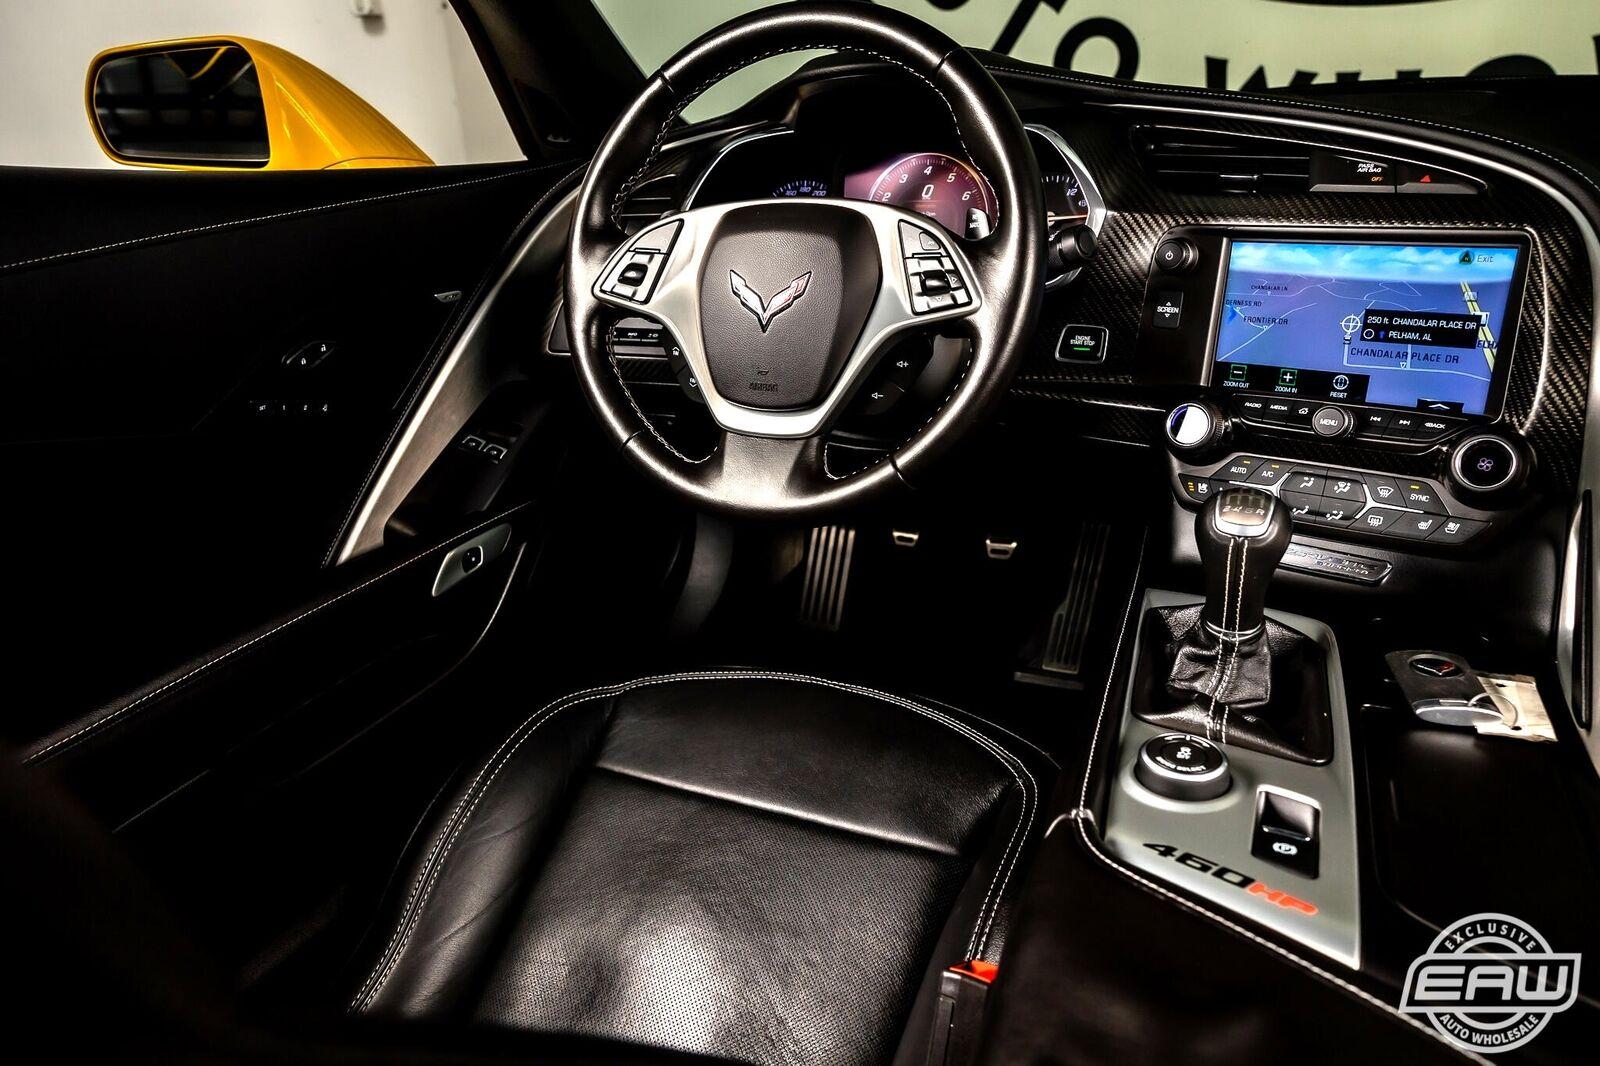 2014 Yellow Chevrolet Corvette Coupe 2LT   C7 Corvette Photo 7